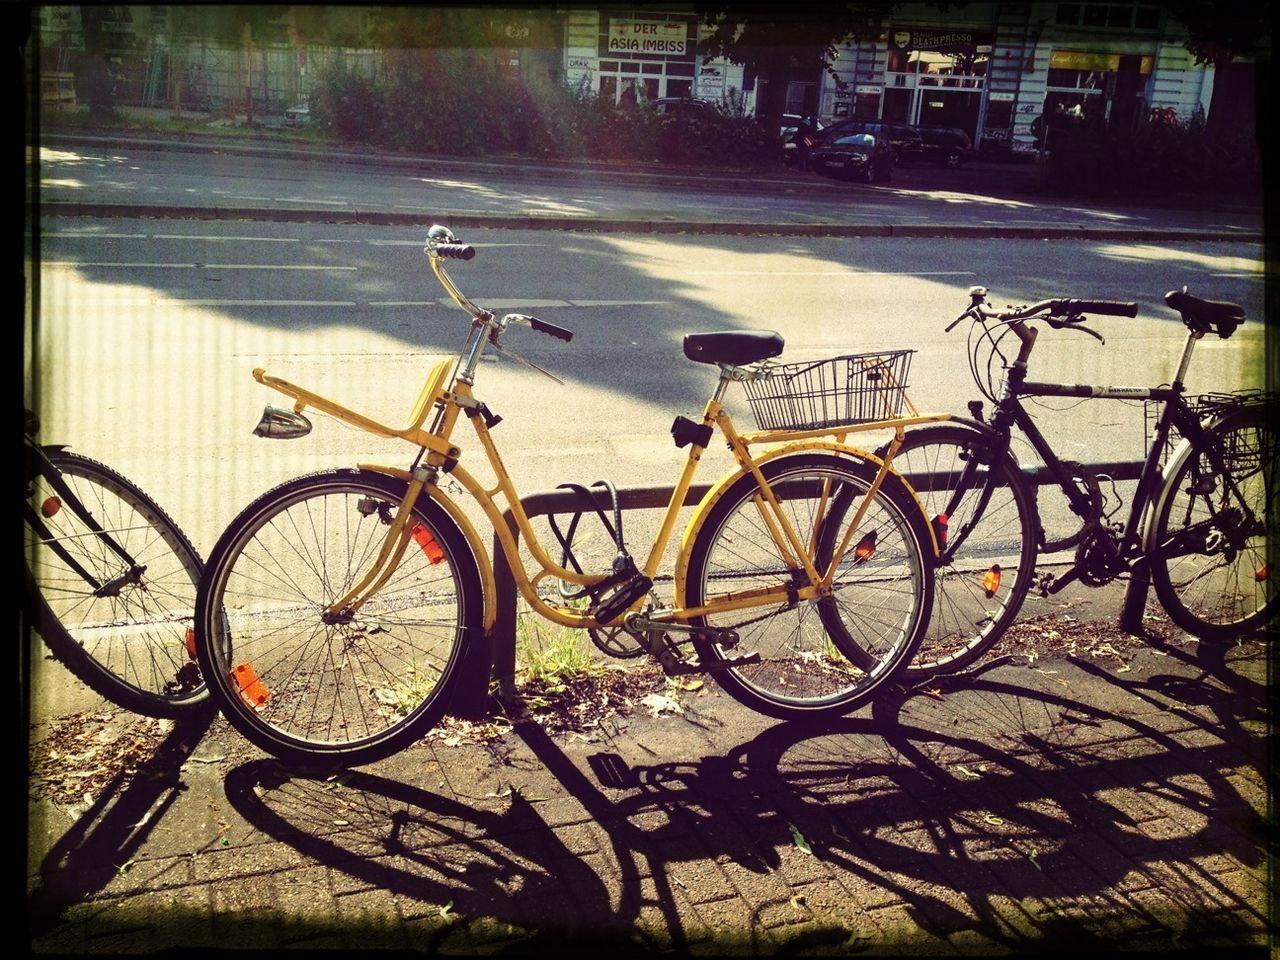 Streetphotography IPhoneography Taking Photos Bike Week